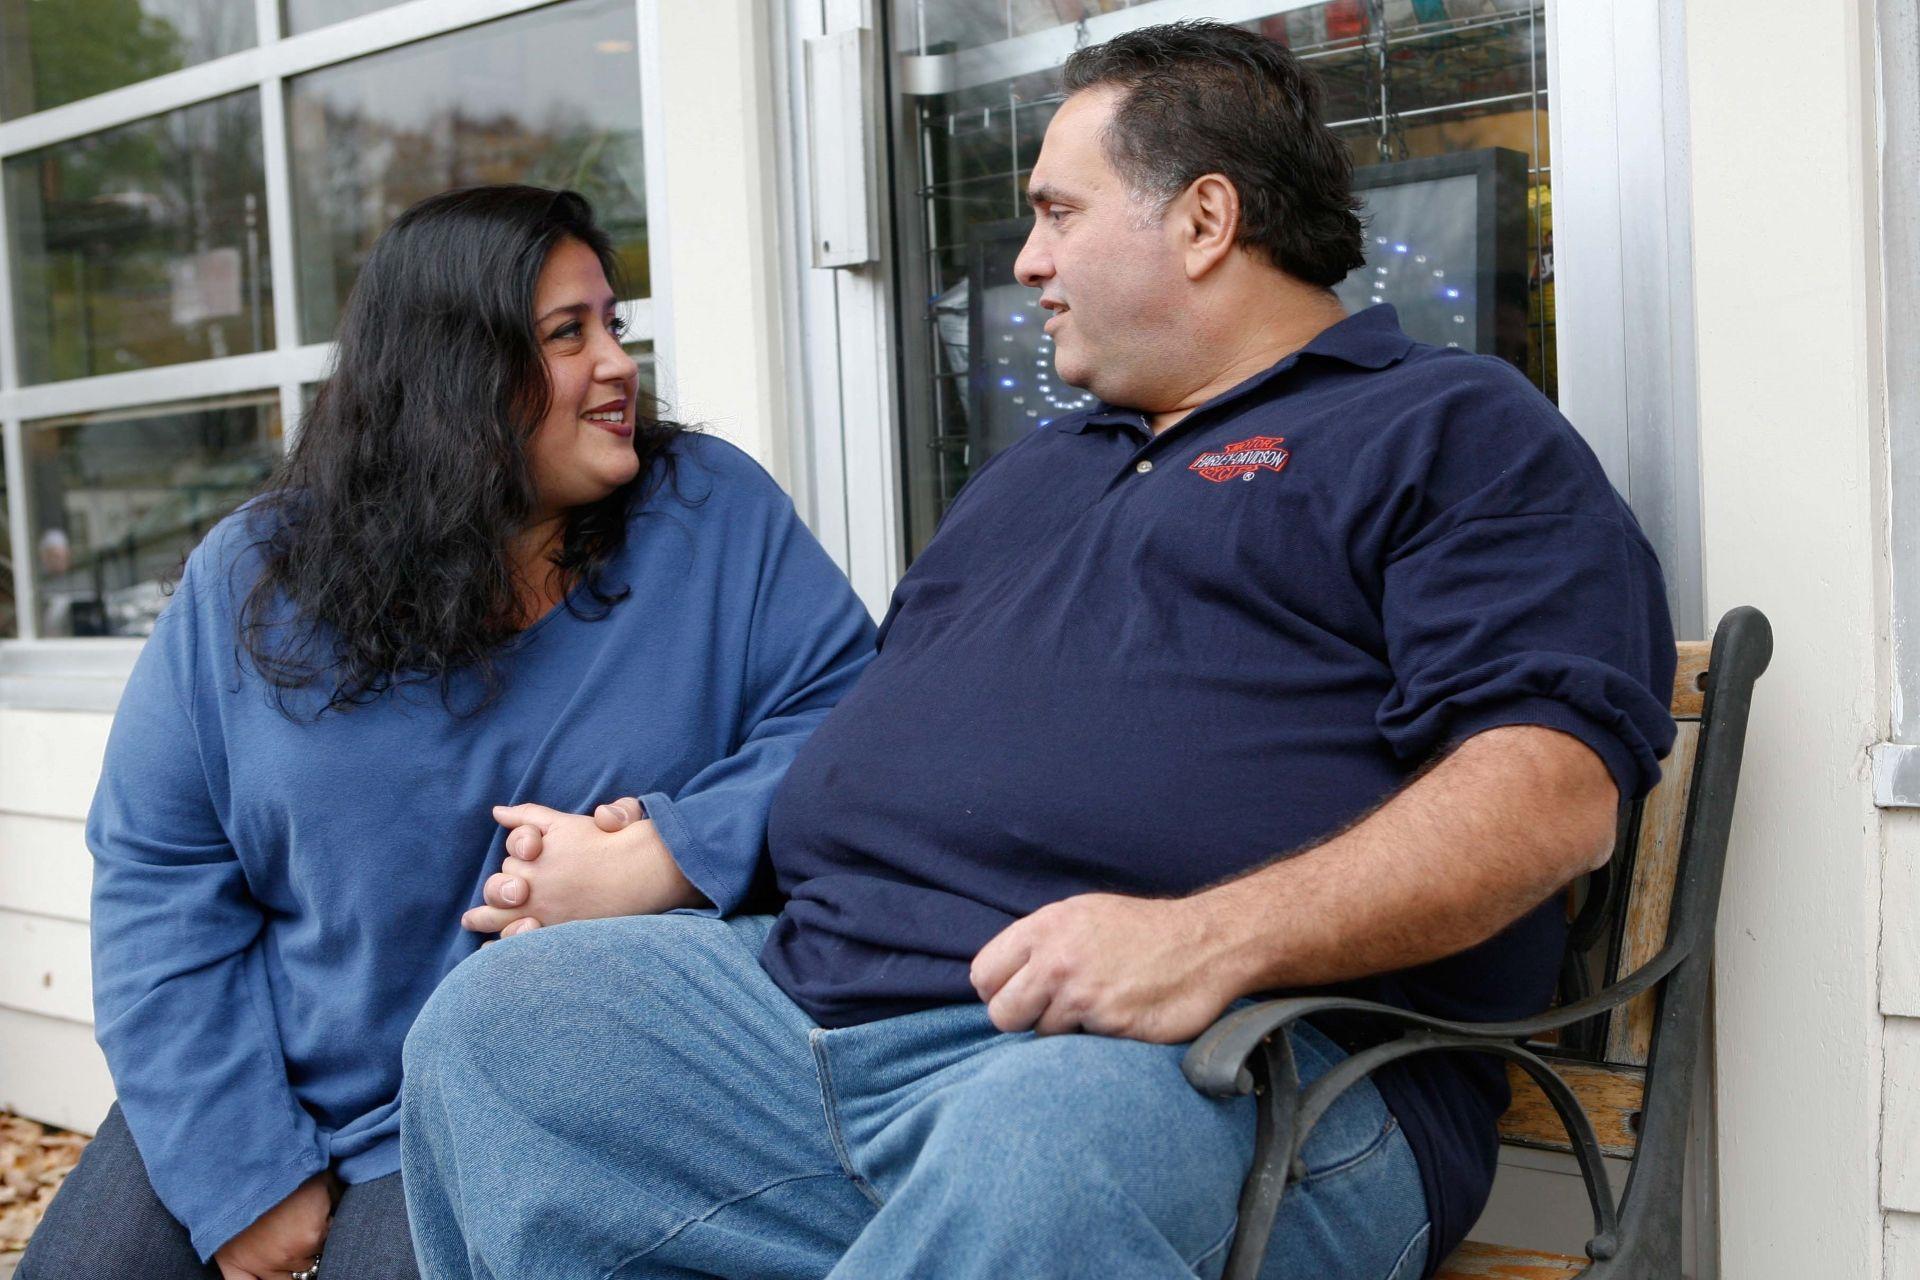 Риск сахарного диабета в супружеских парах